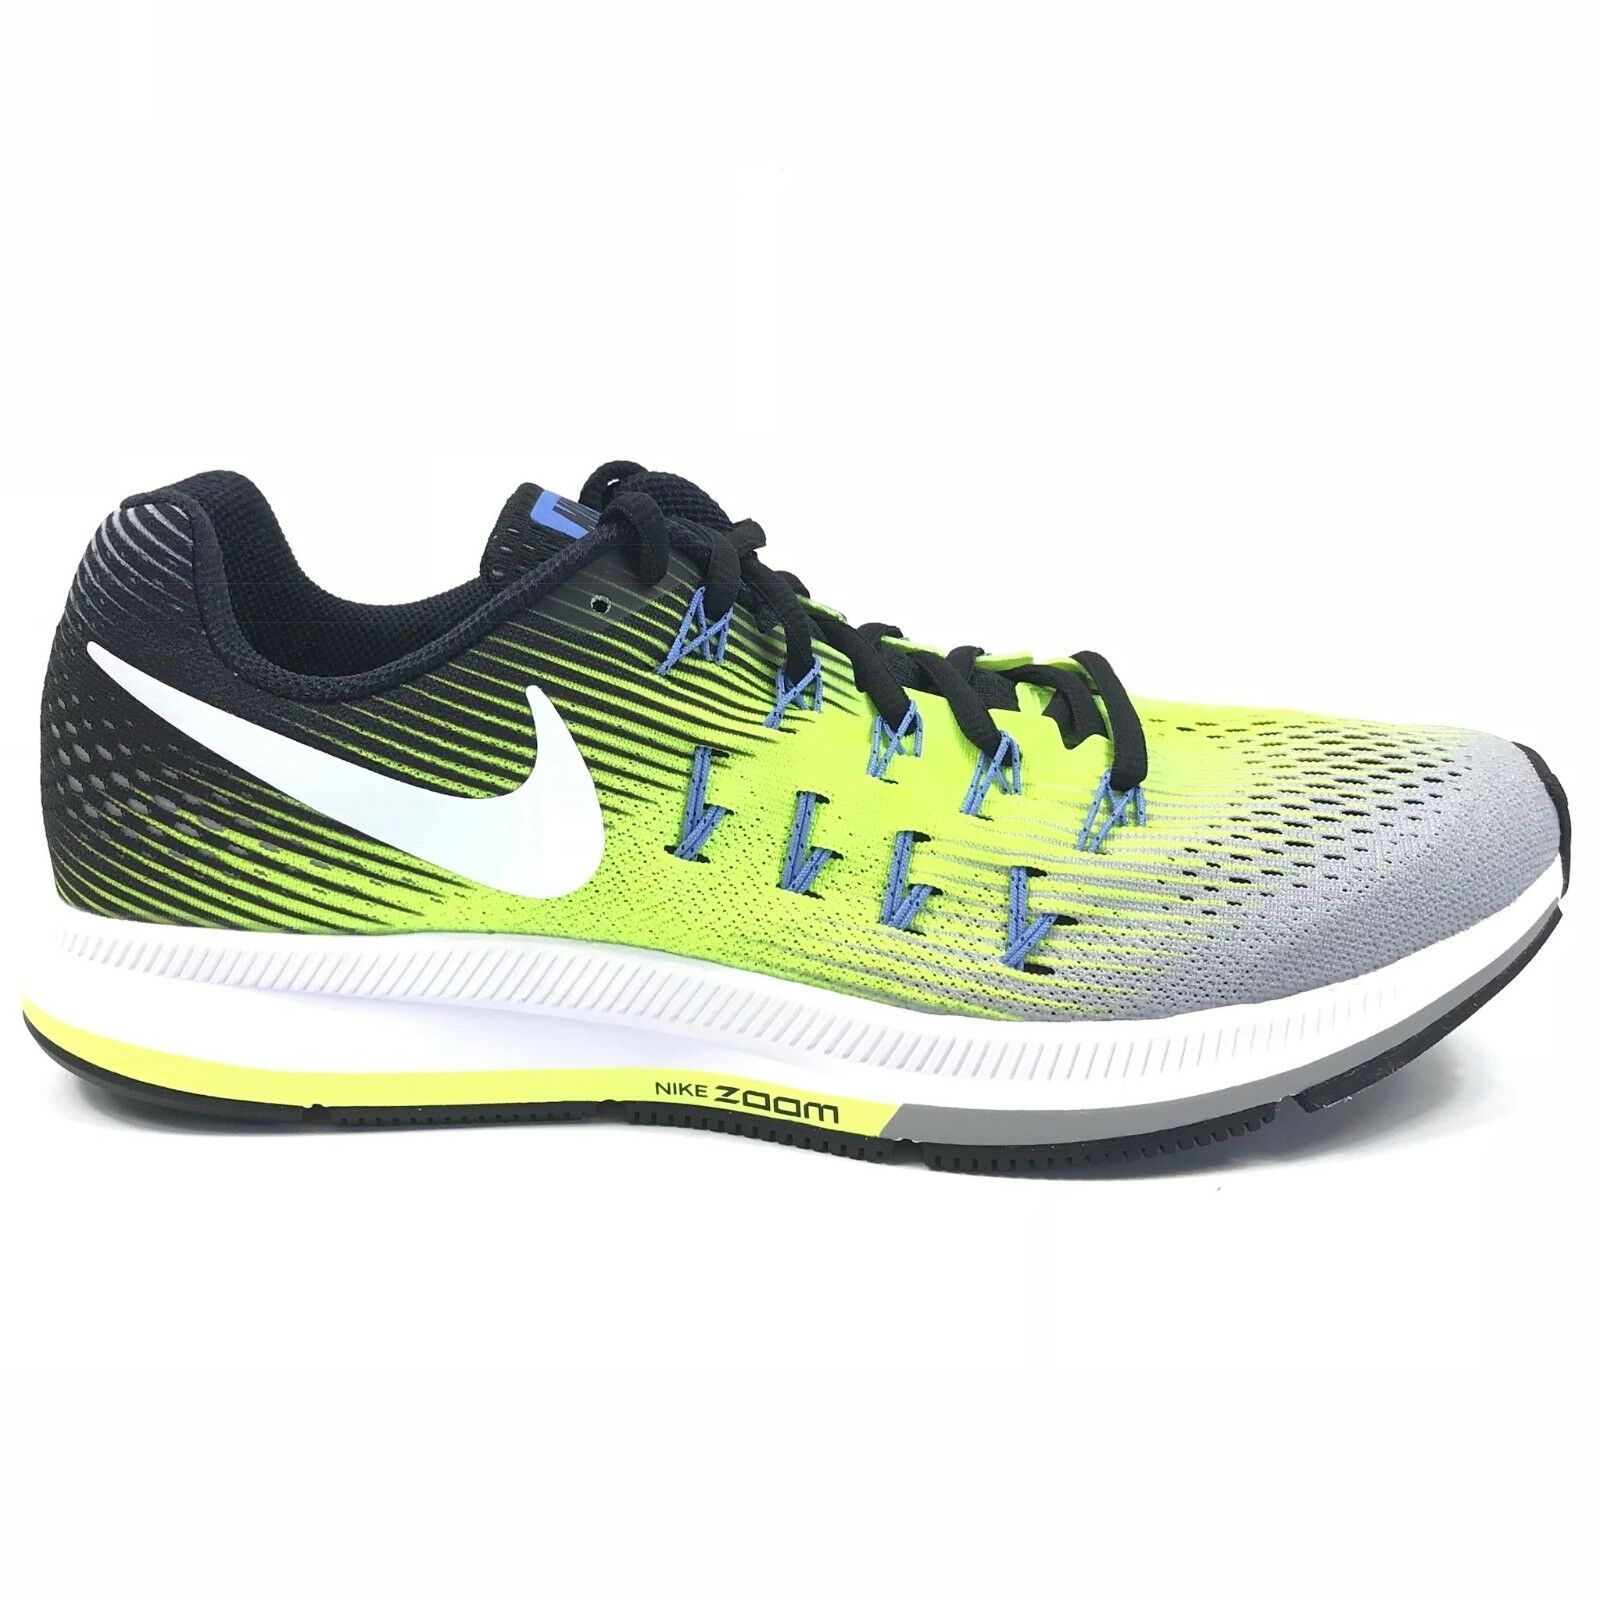 NEW Nike Mens Air Zoom Pegasus 33 Athletic Running shoes Volt 831352-007 US 9